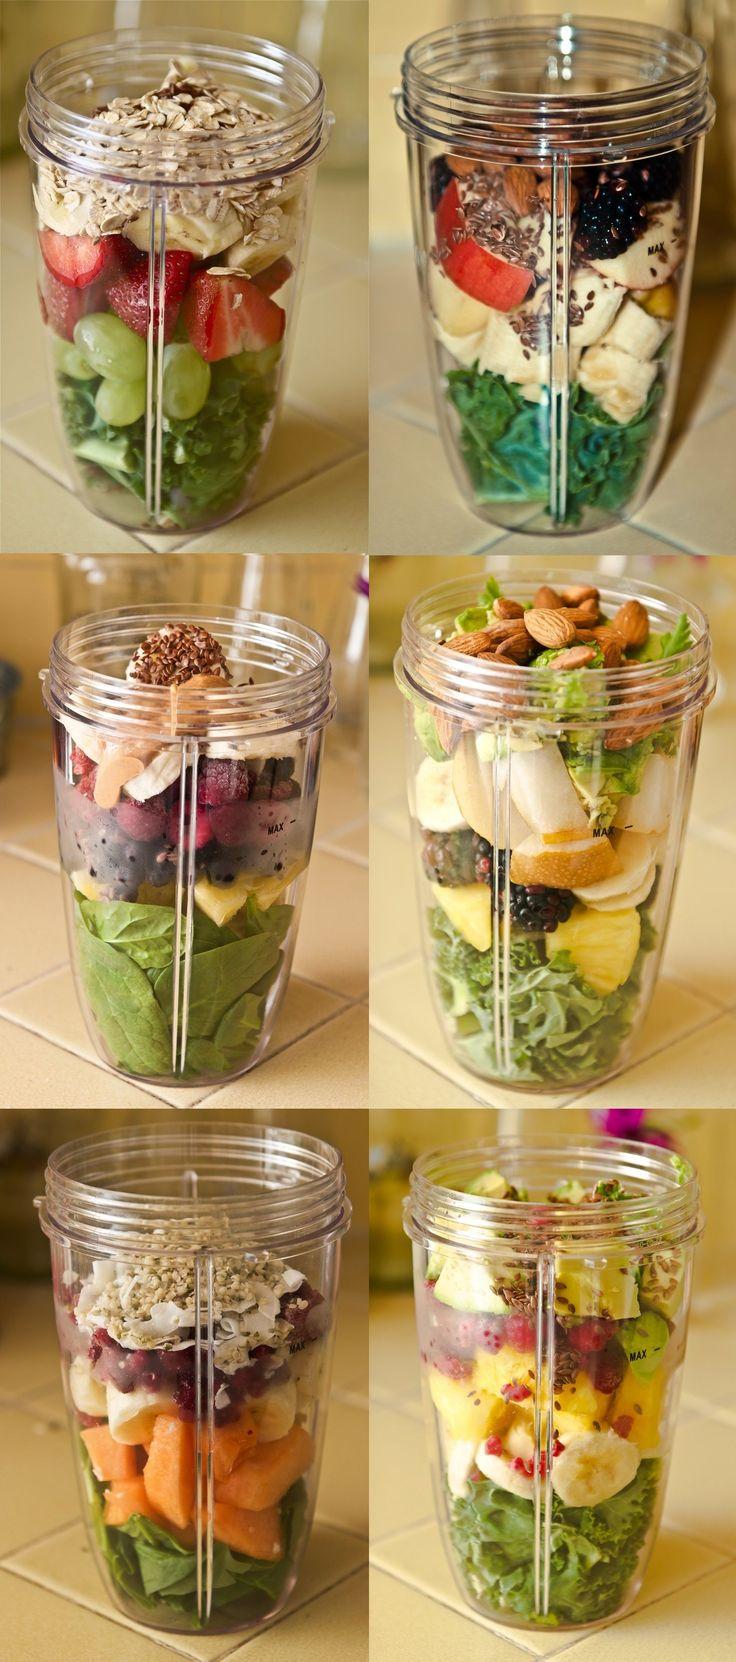 Healthy #Smoothie Recipes